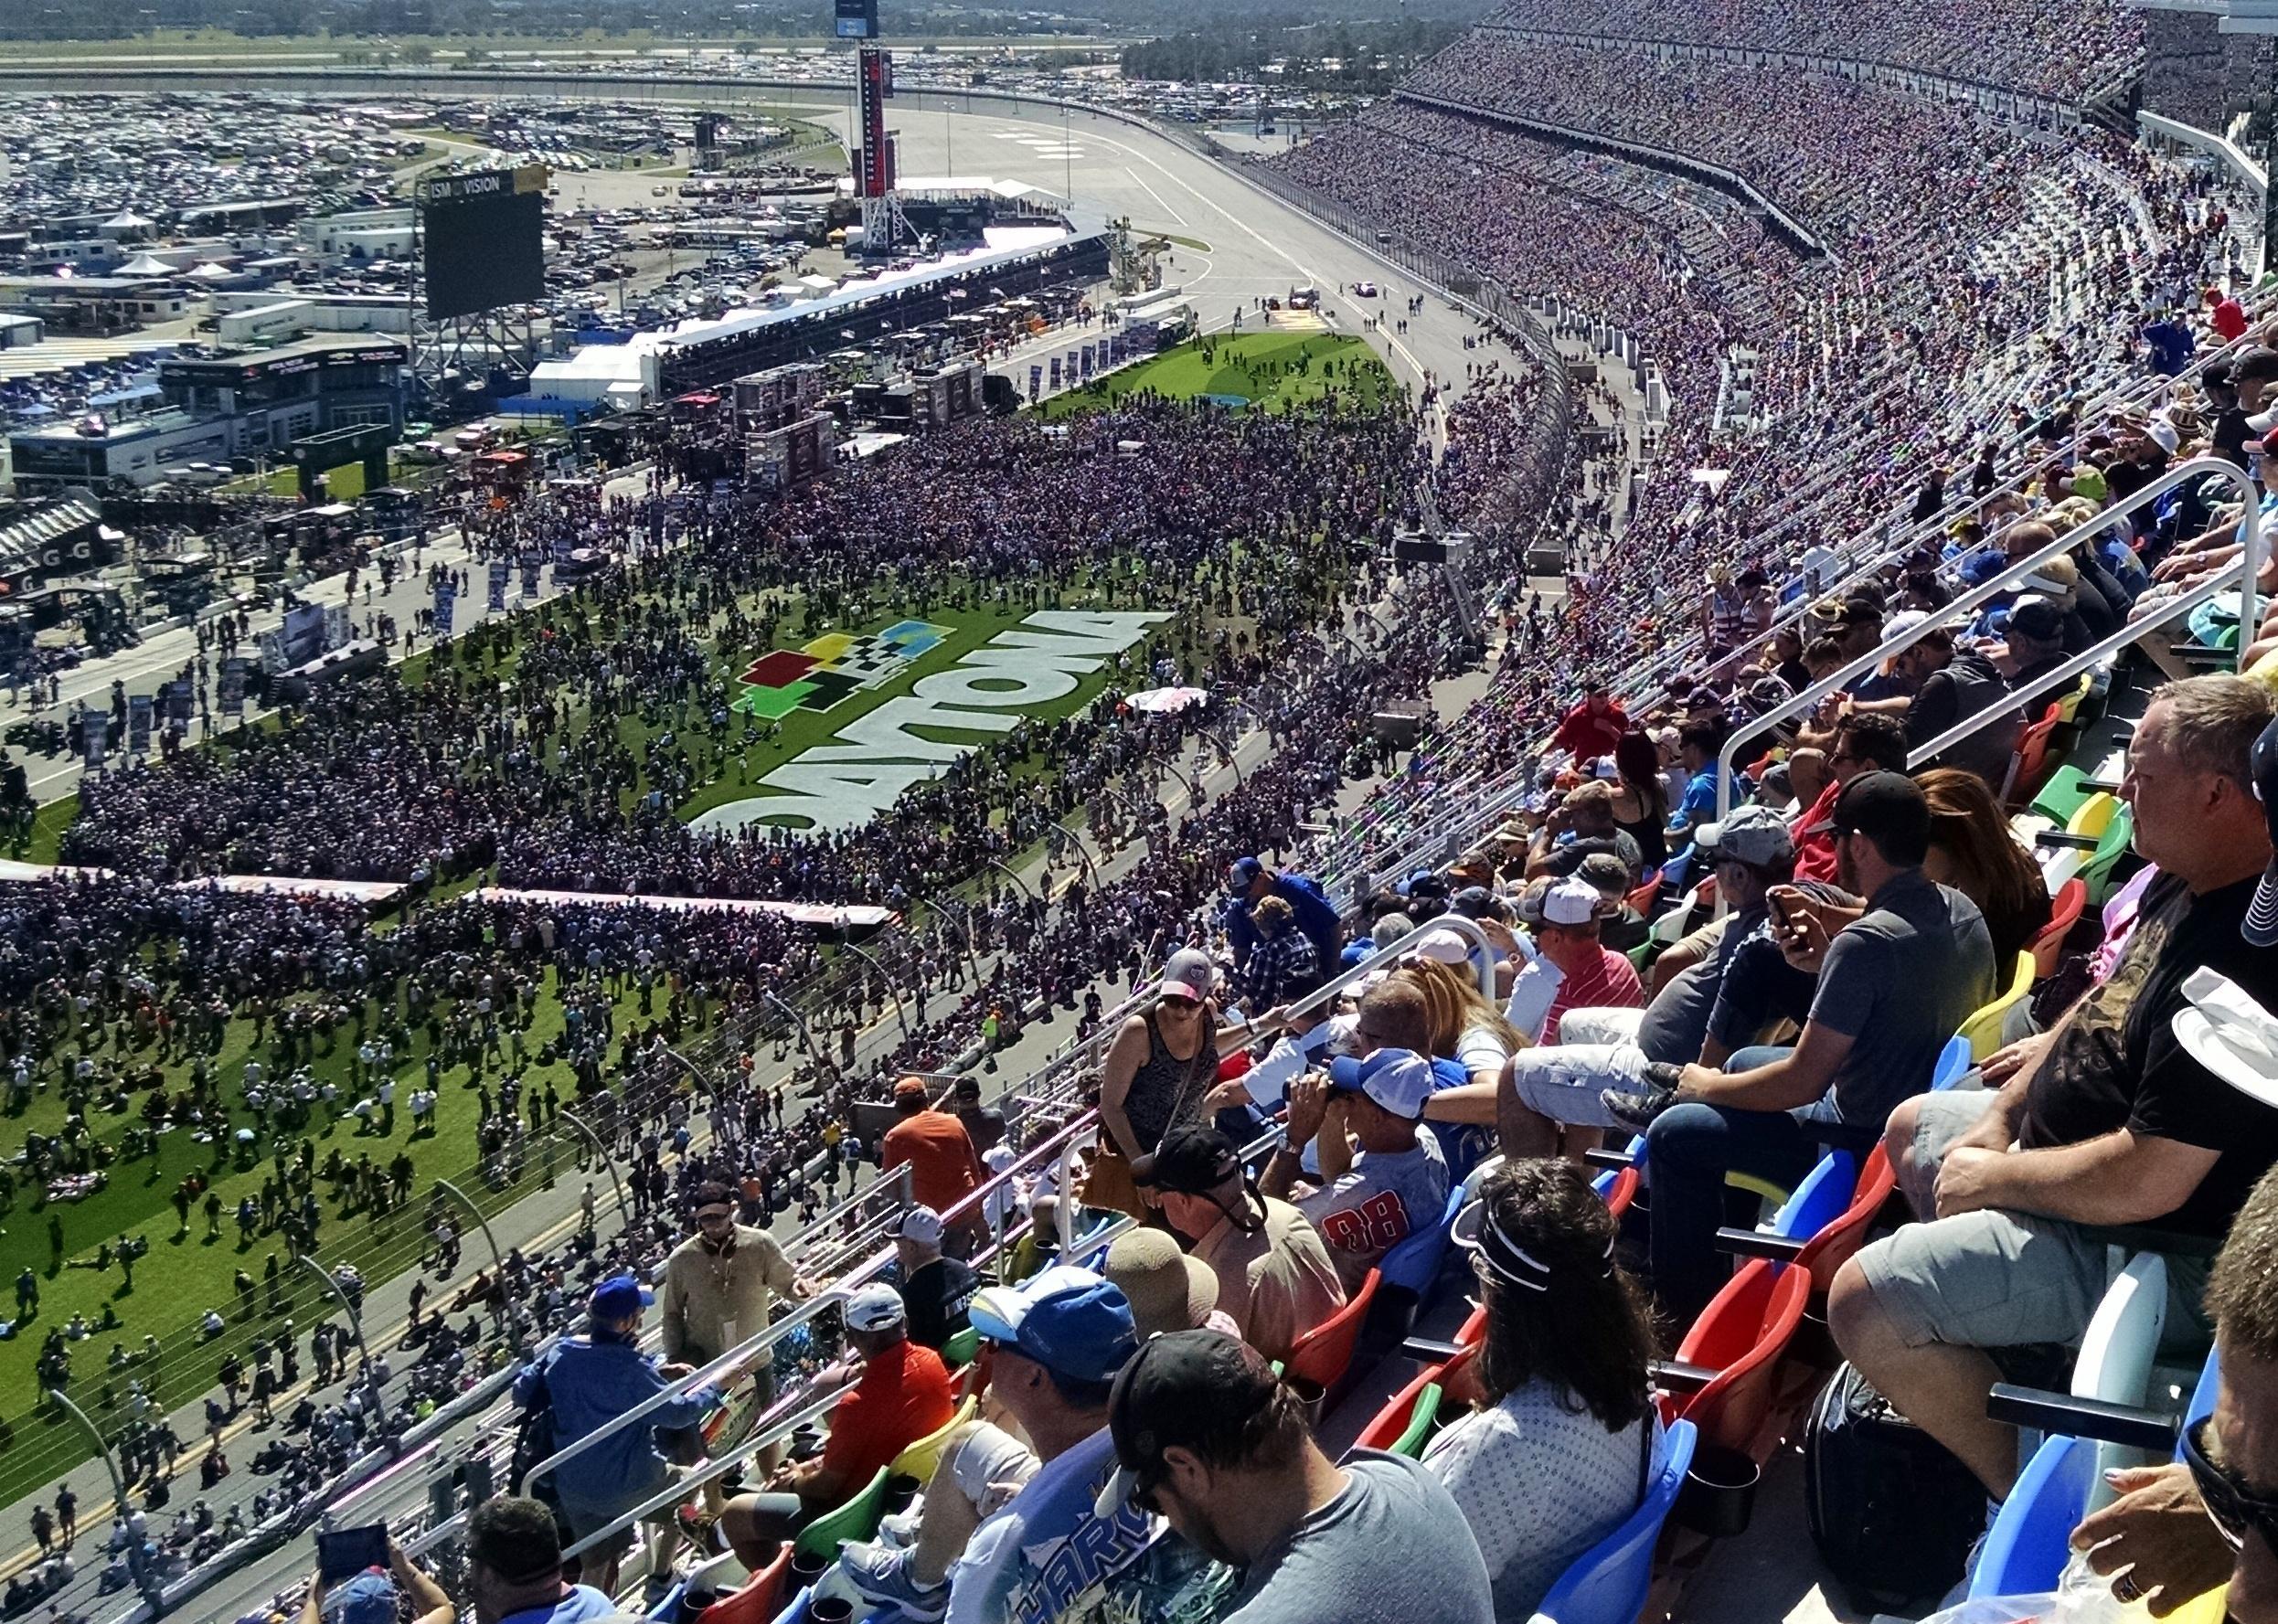 Daytona International Speedway Section 438 Row 38 Seat 17